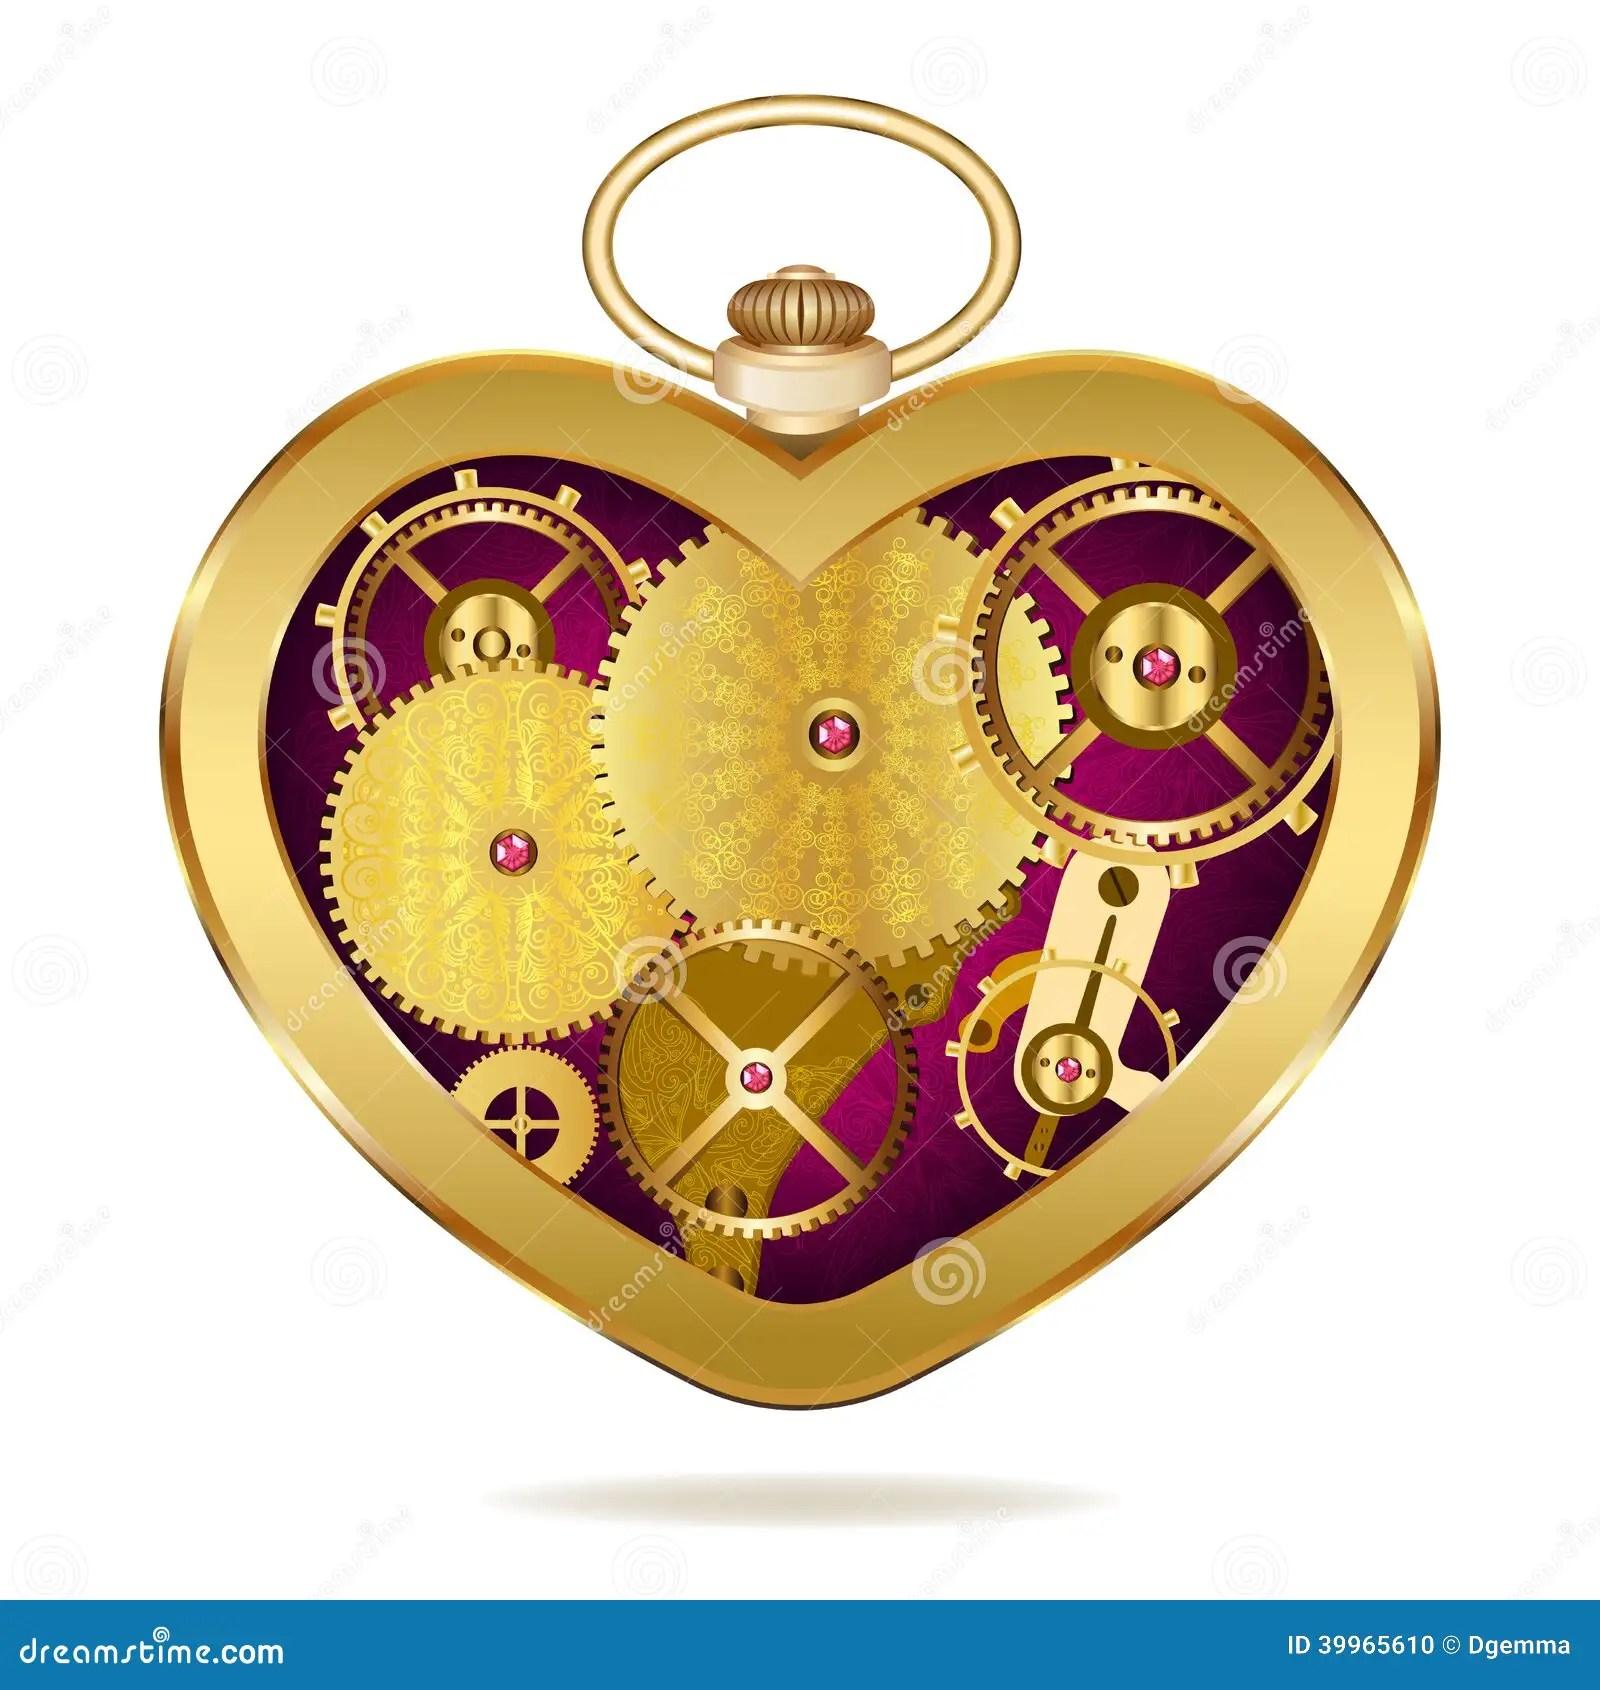 clockwork heart shaped clock